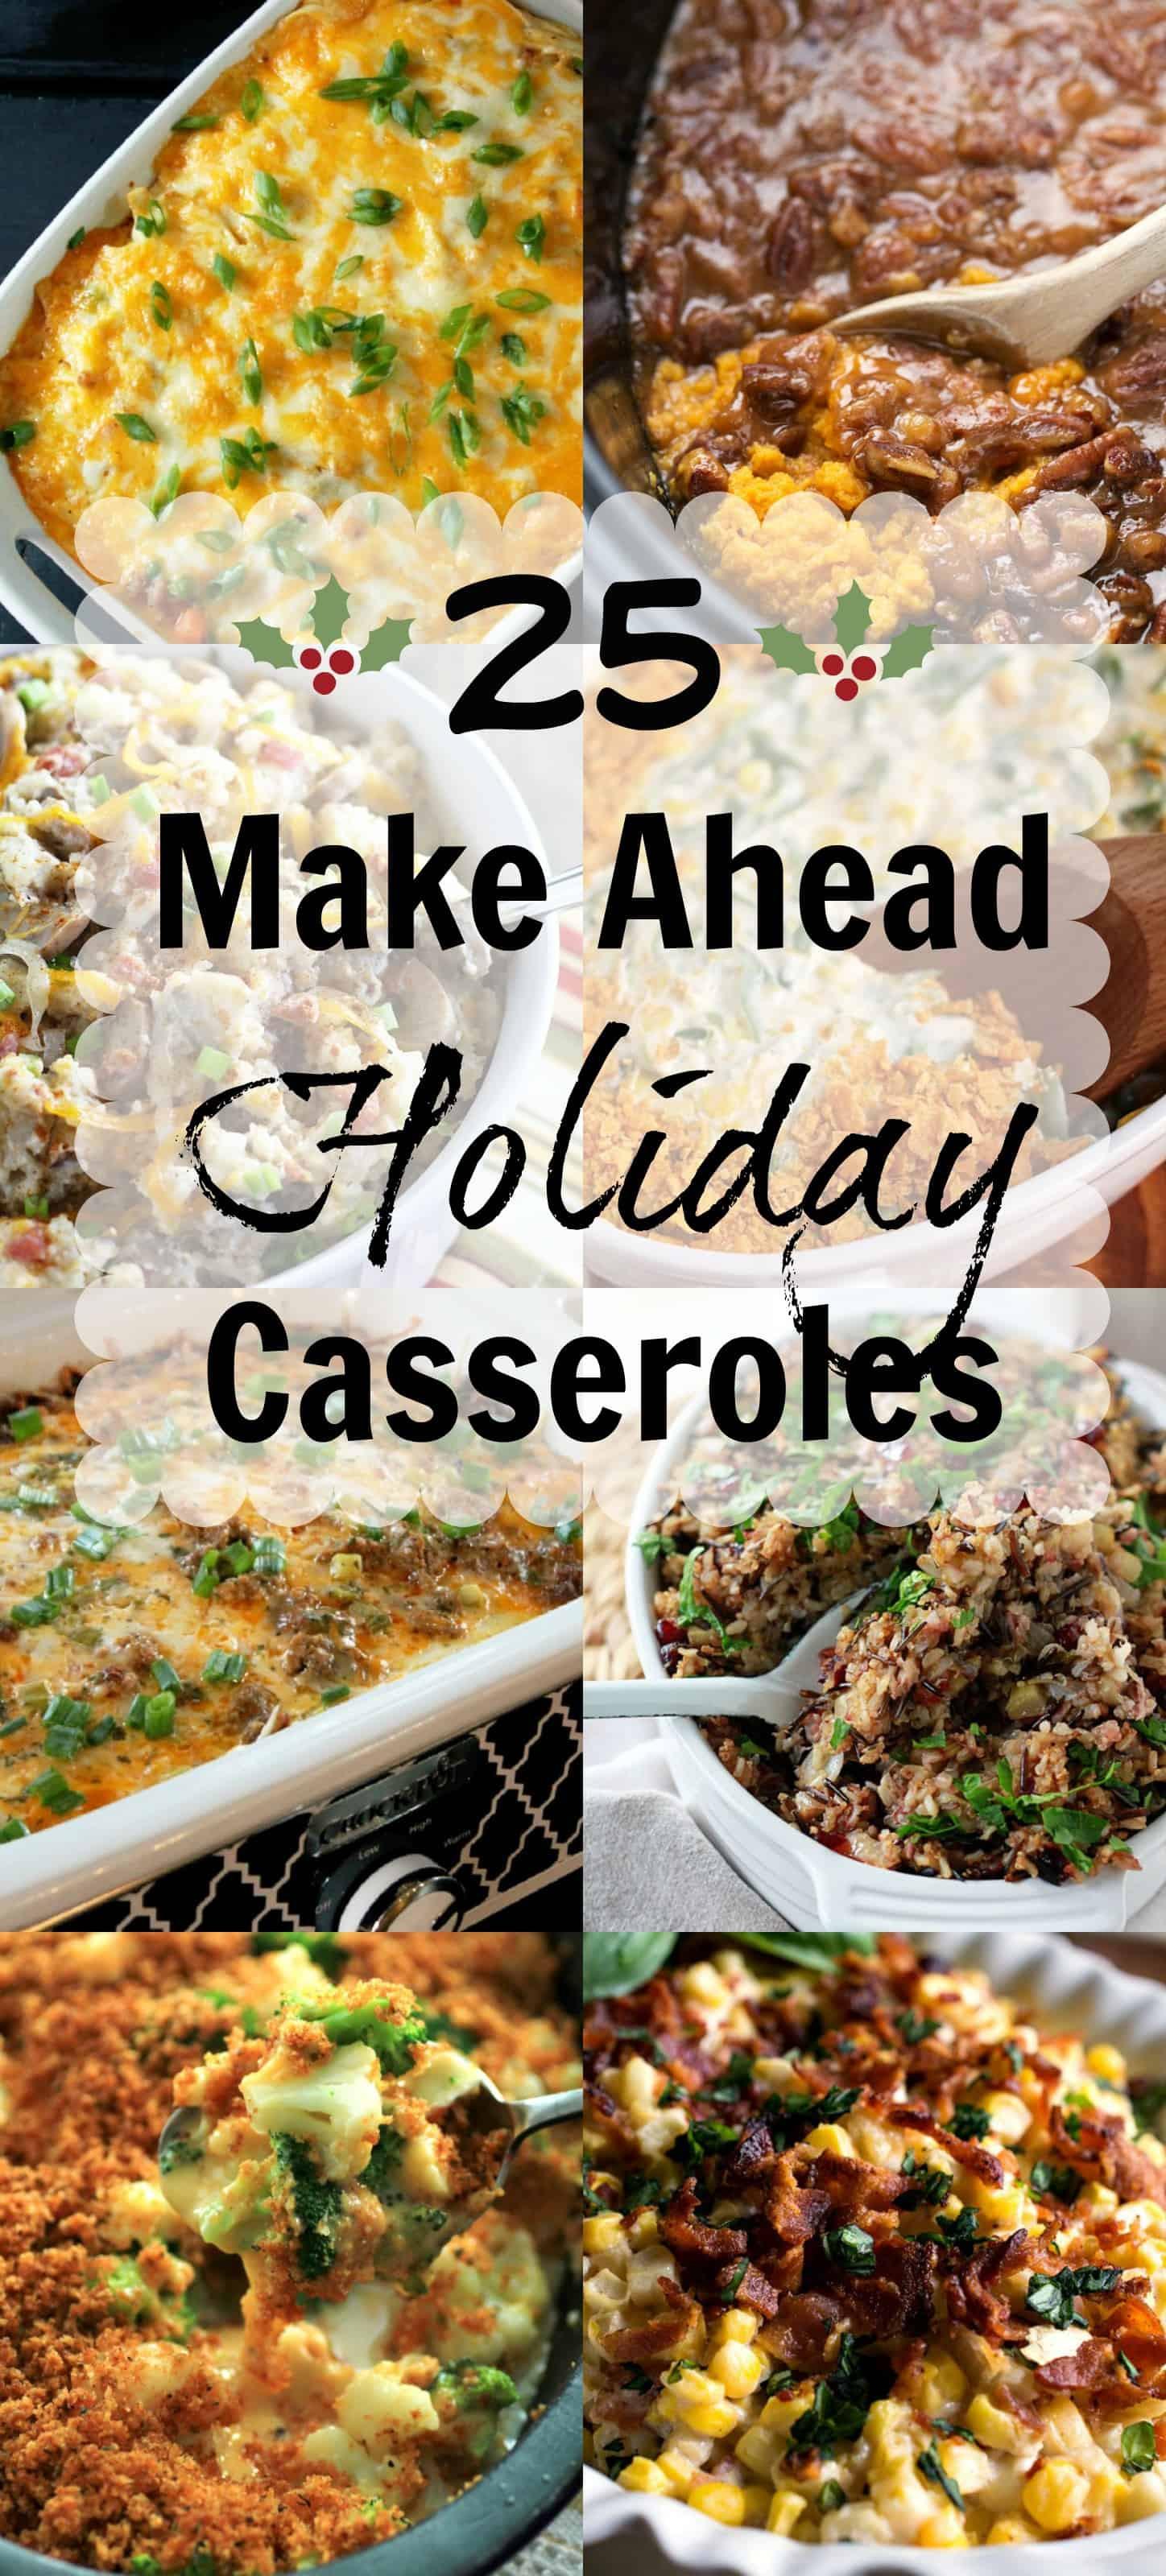 Make Ahead Christmas Dinners  25 Make Ahead Thanksgiving Casseroles